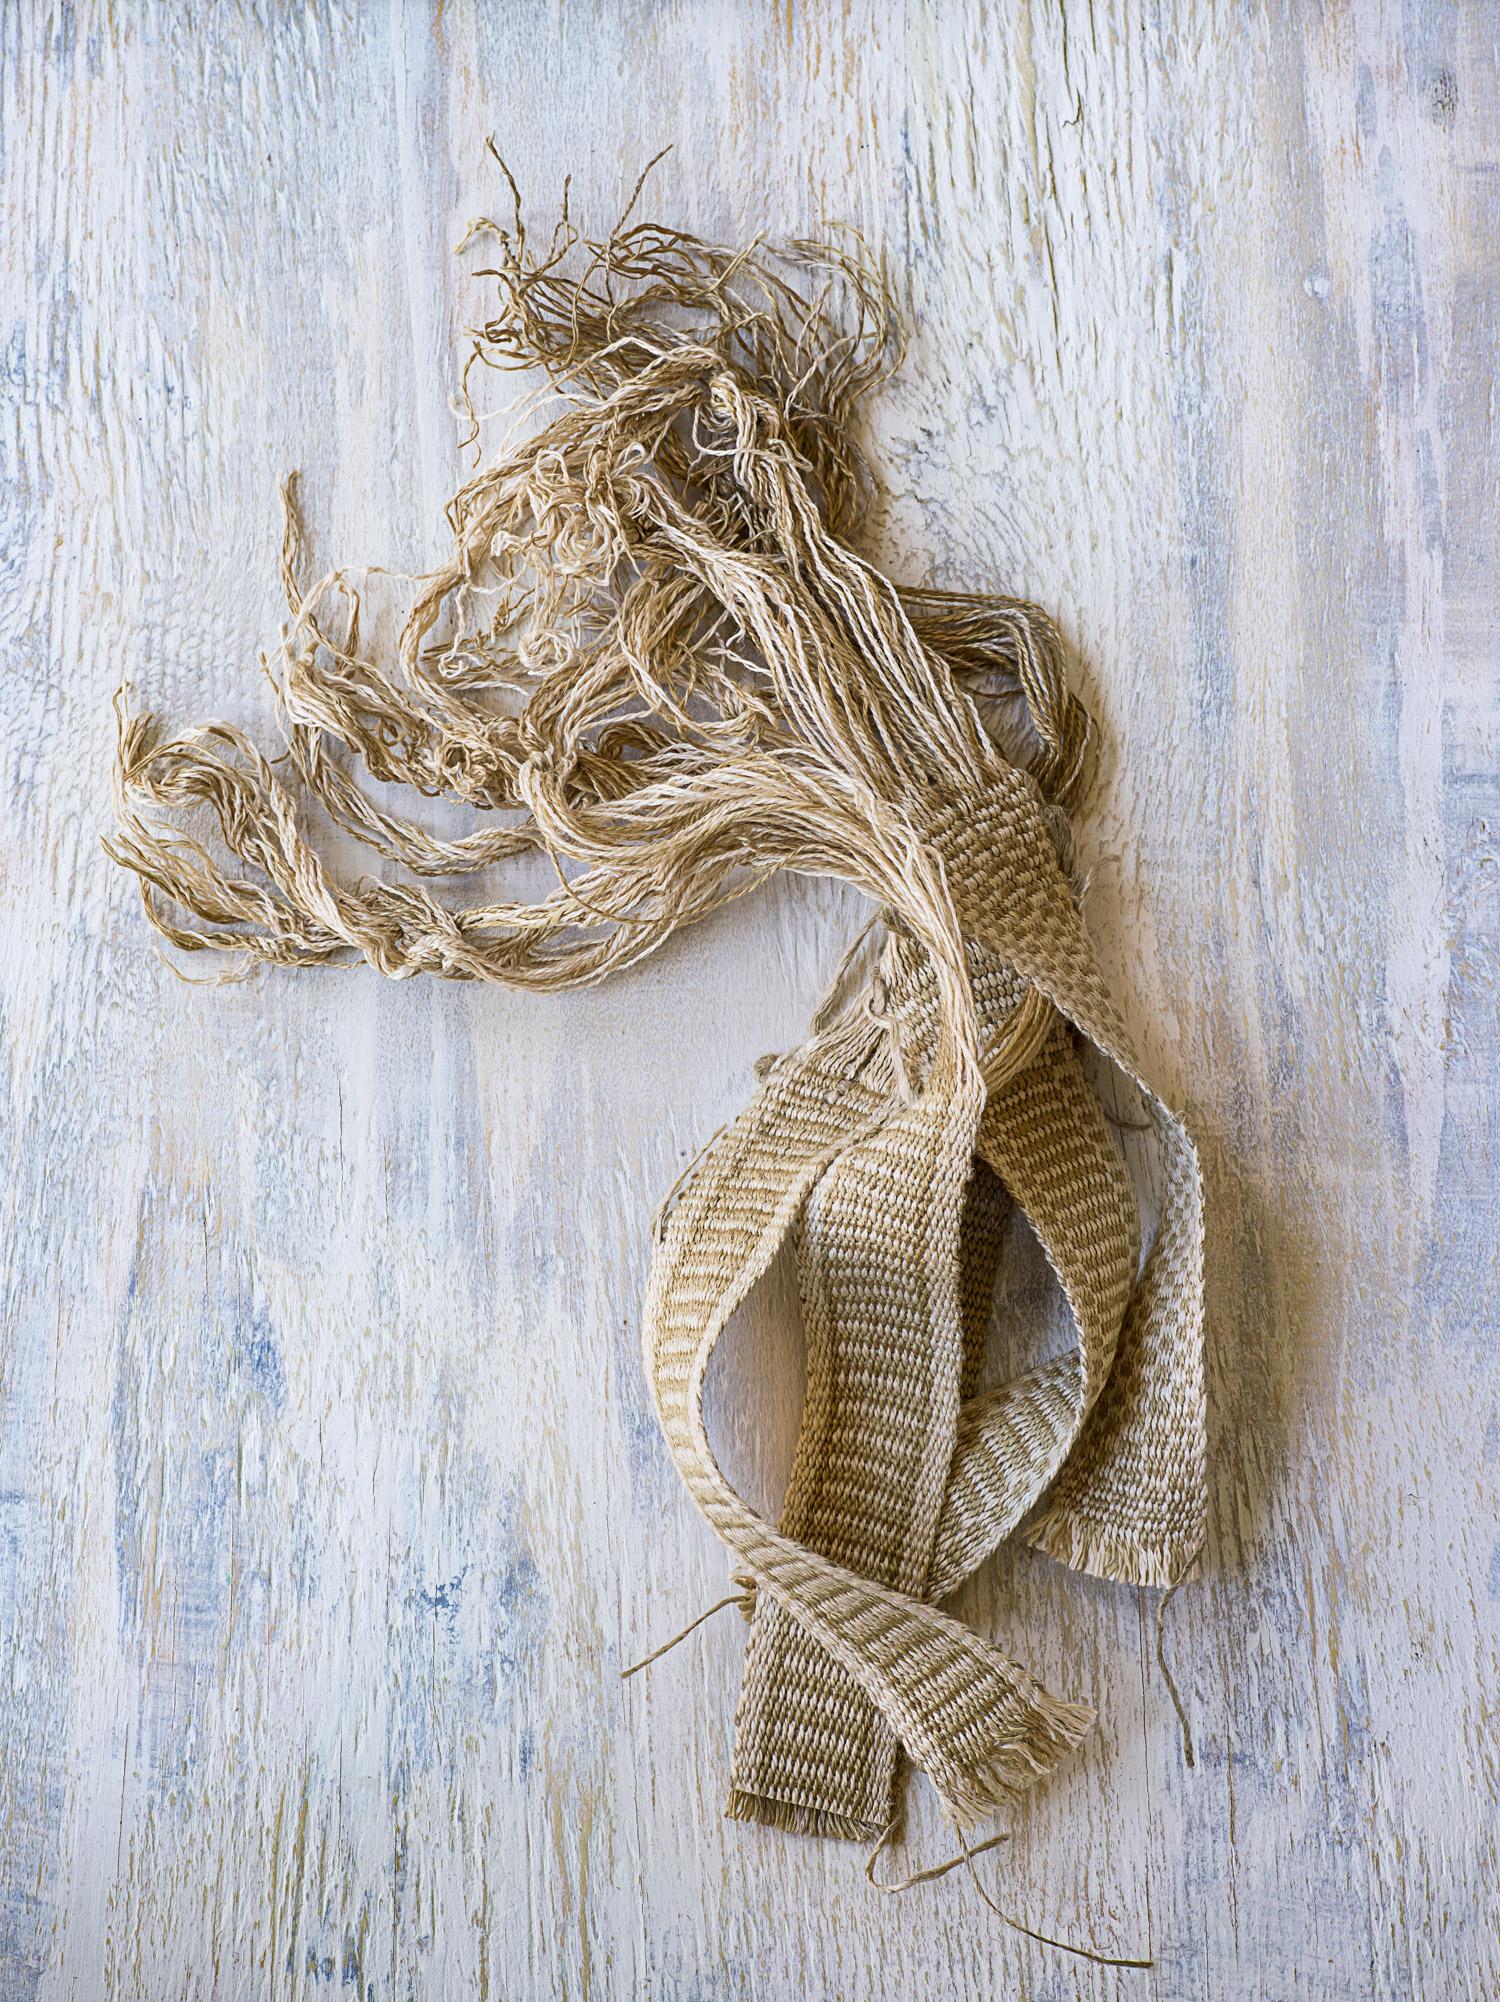 Cut ends of linen tape